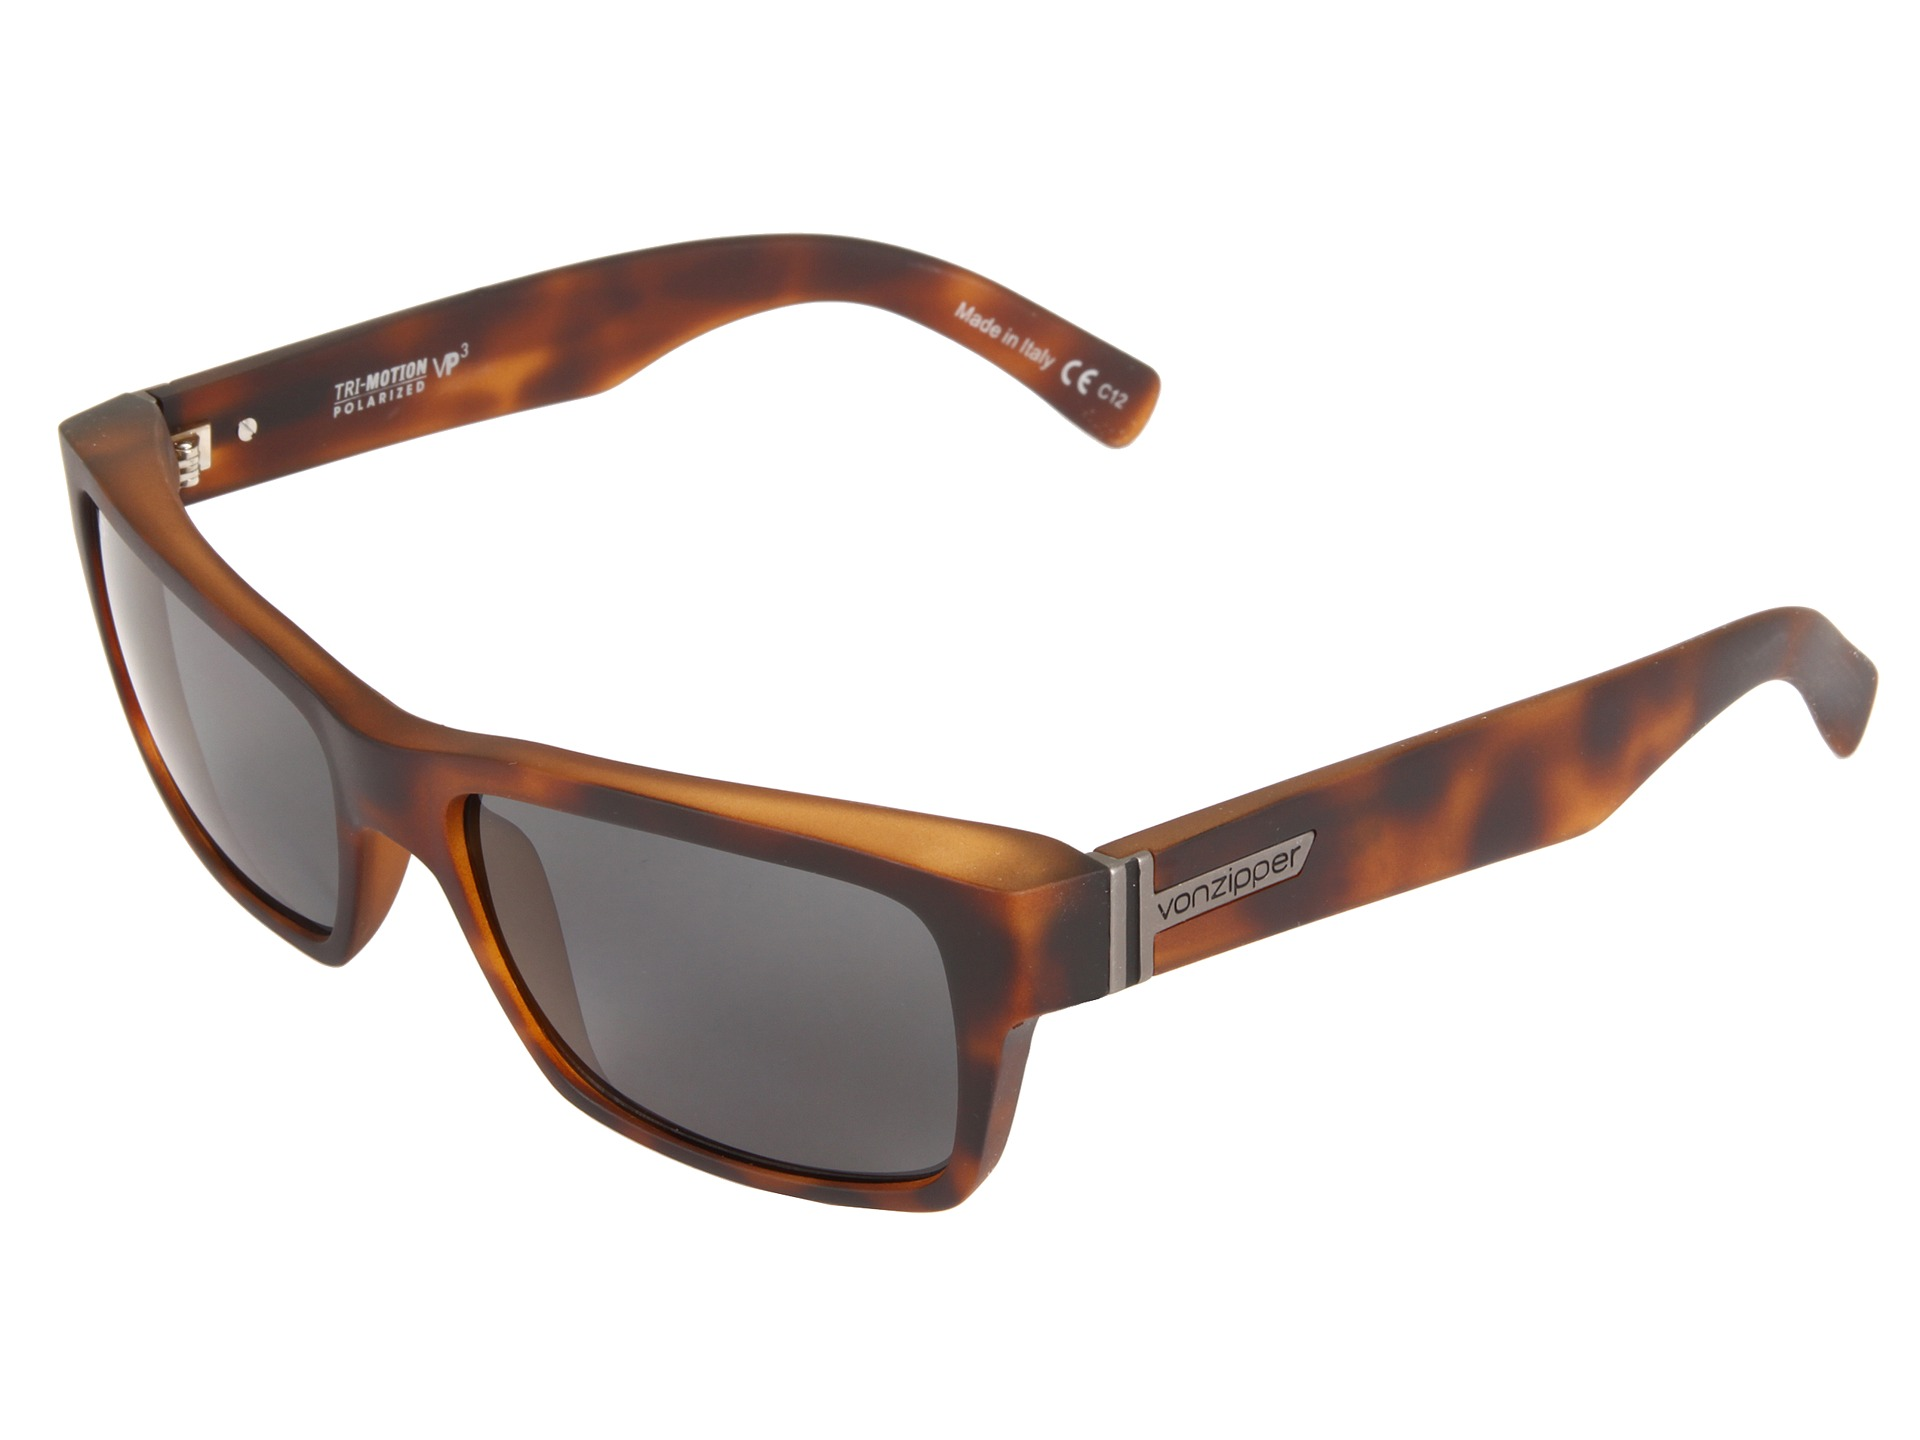 4a8b82ebf2e Vonzipper Womens Polarized Sunglasses